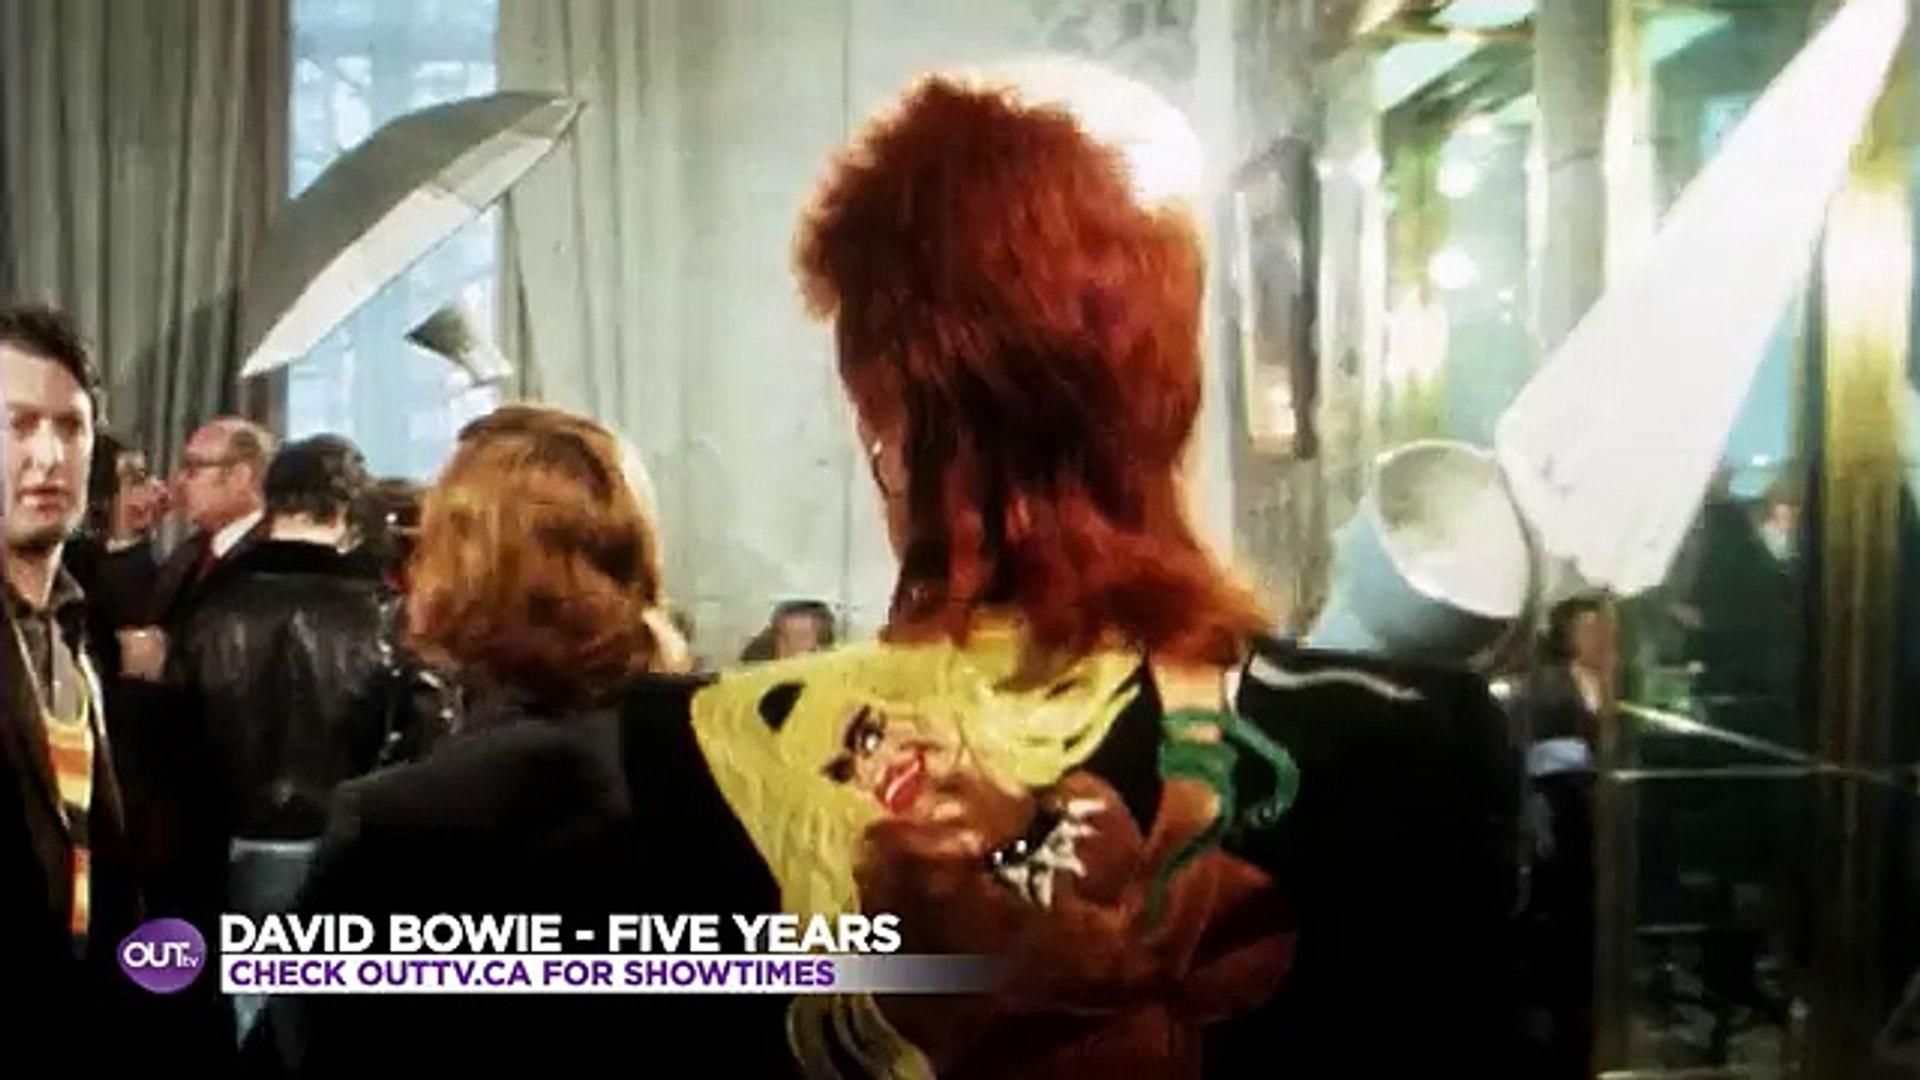 David Bowie - Five Years  Trailer 2013